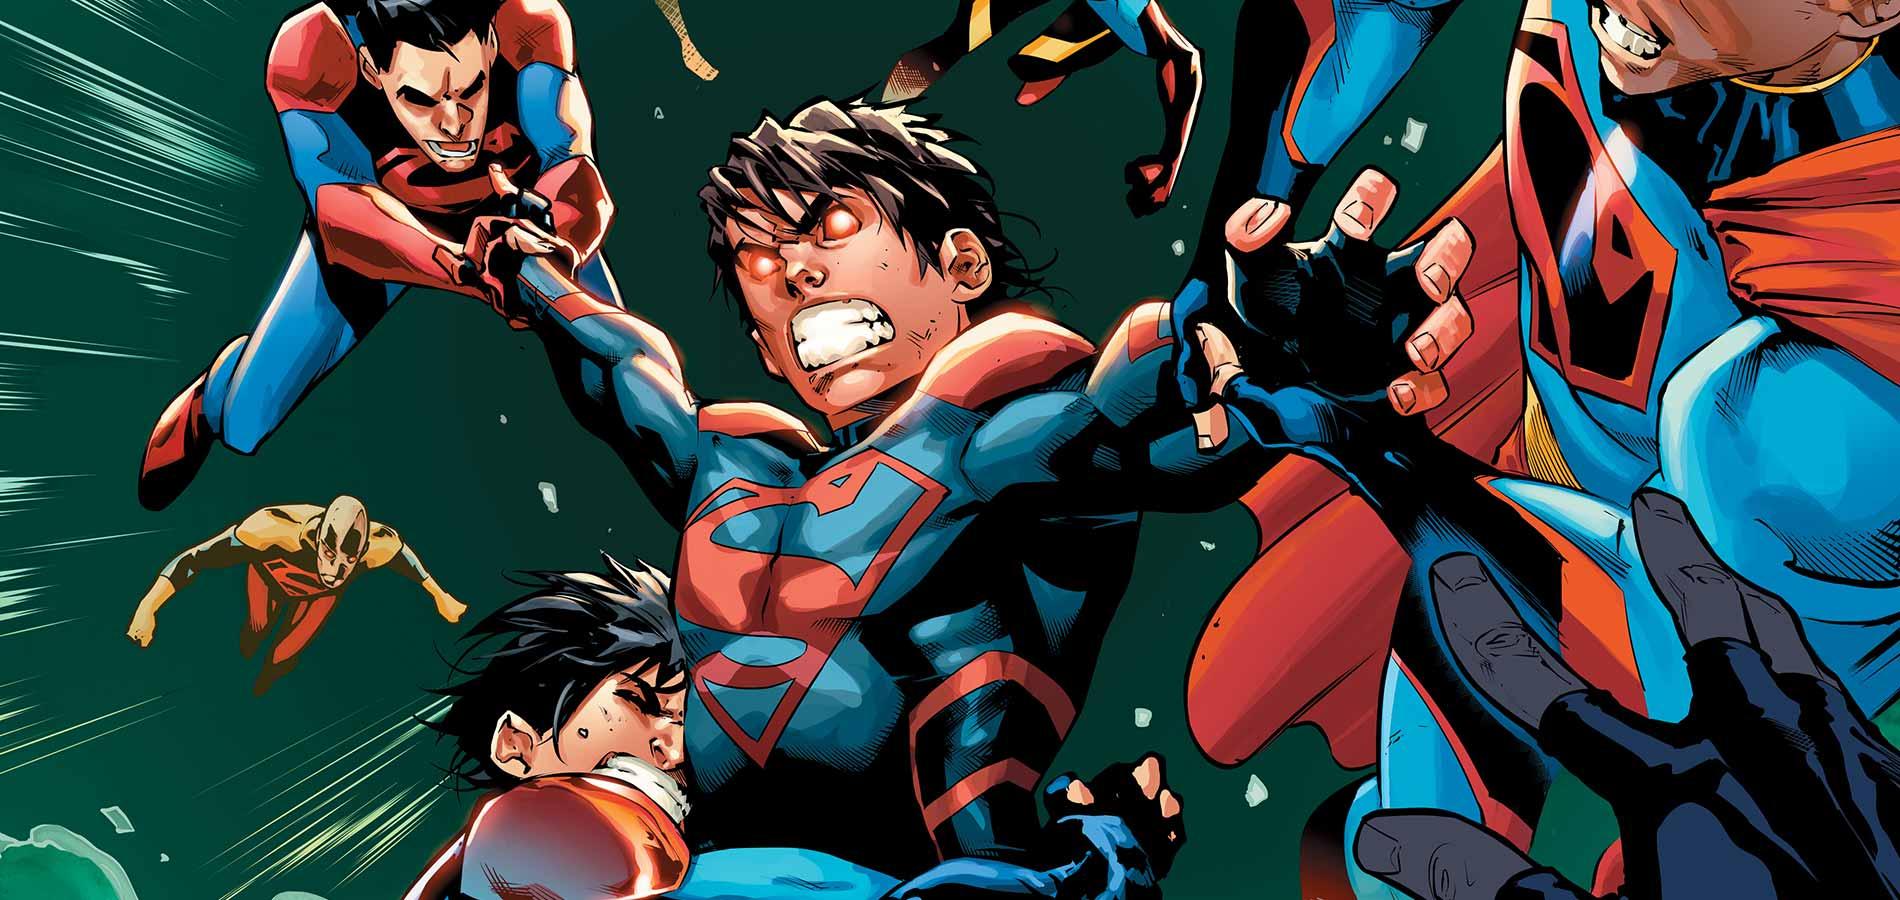 High Resolution Wallpaper | Superboy 1900x900 px